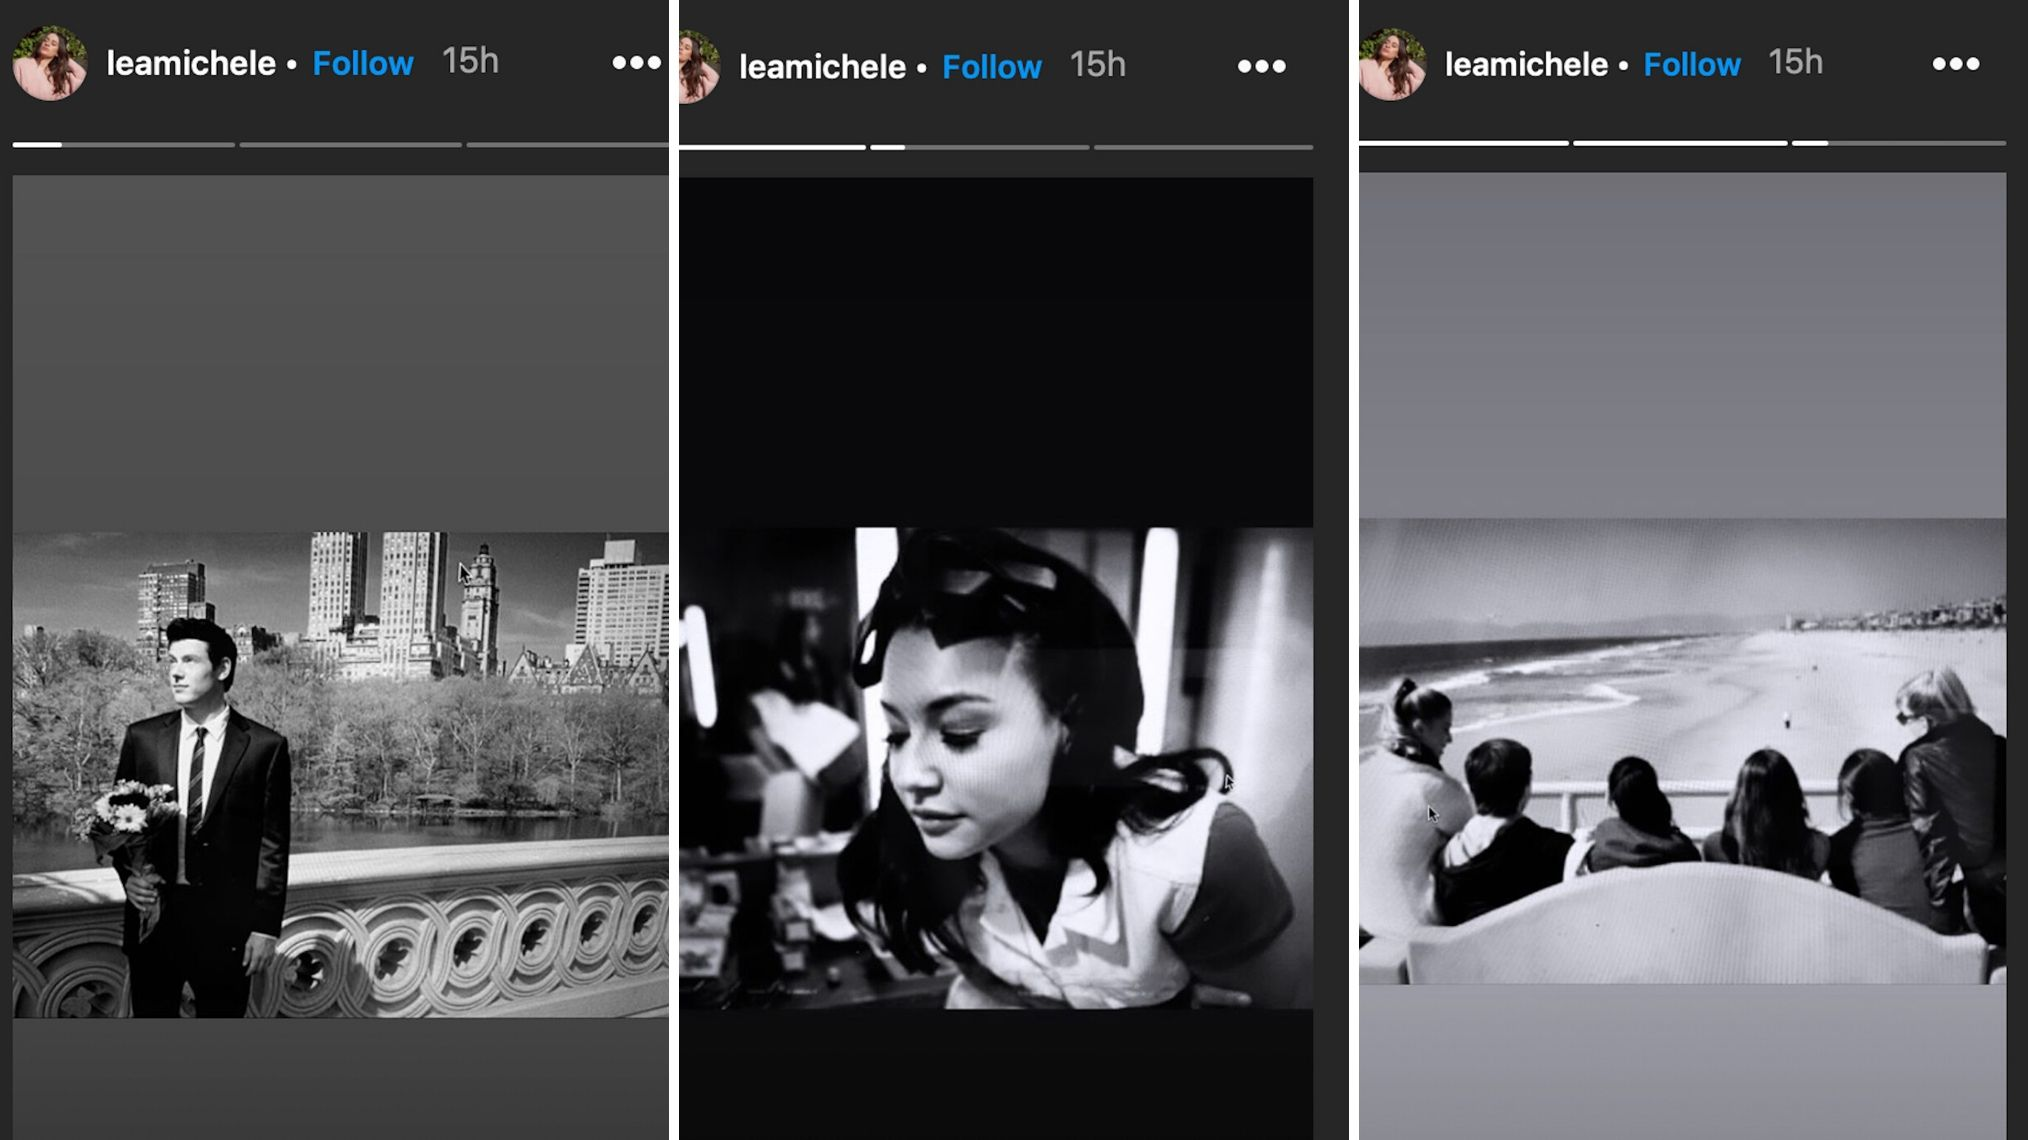 Lea Michele posta foto de Naya Rivera em seu Instagram